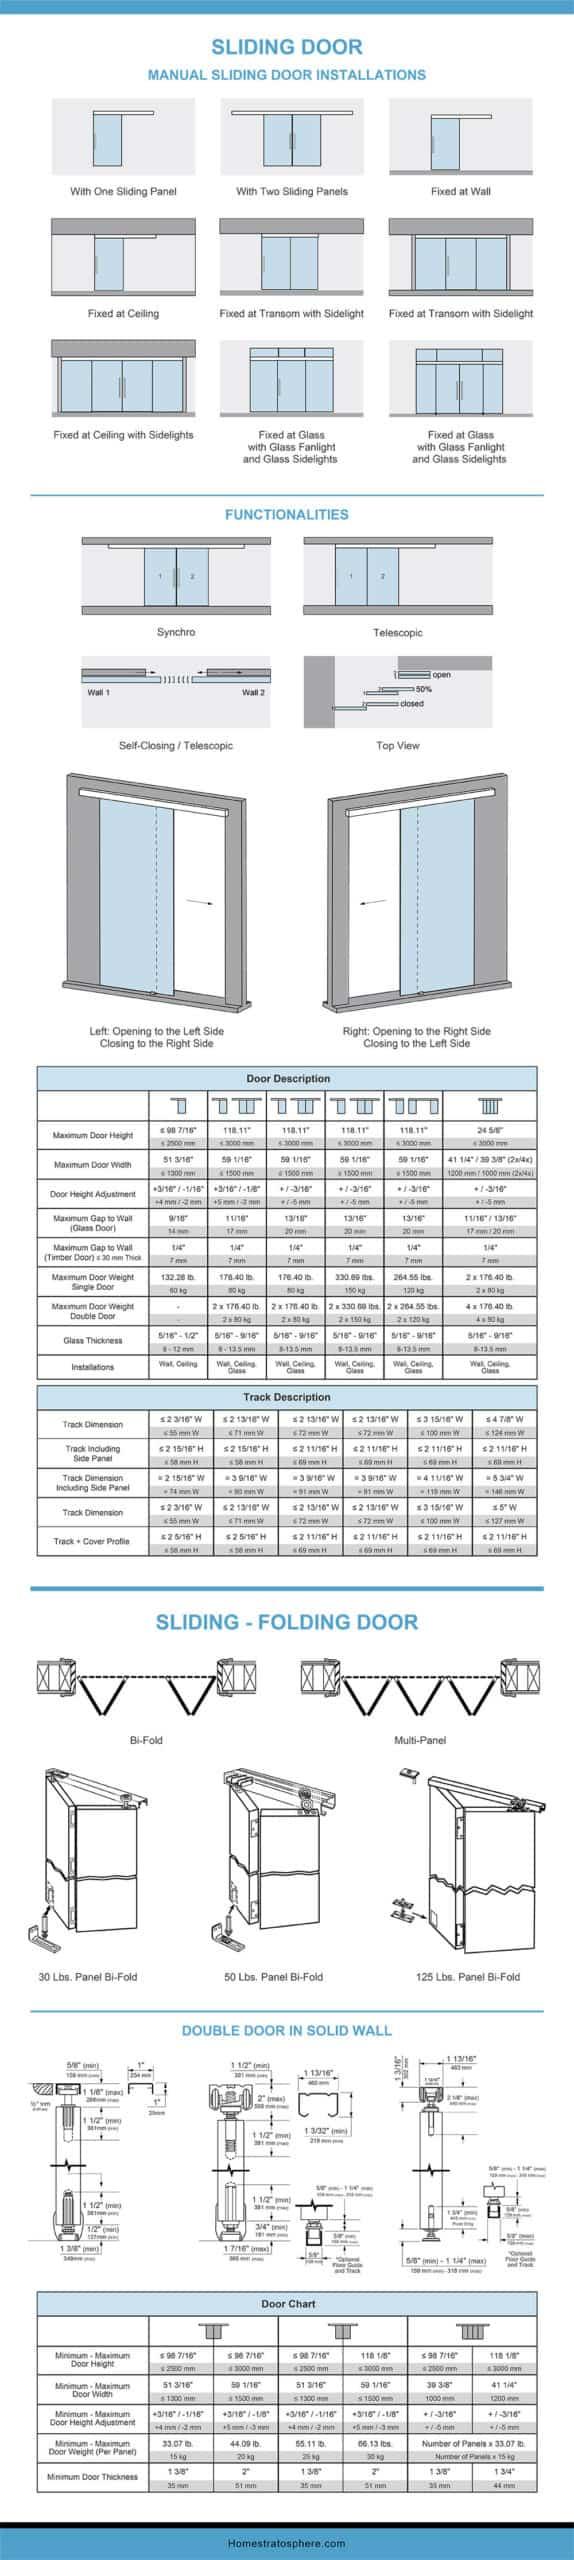 Types of sliding doors chart